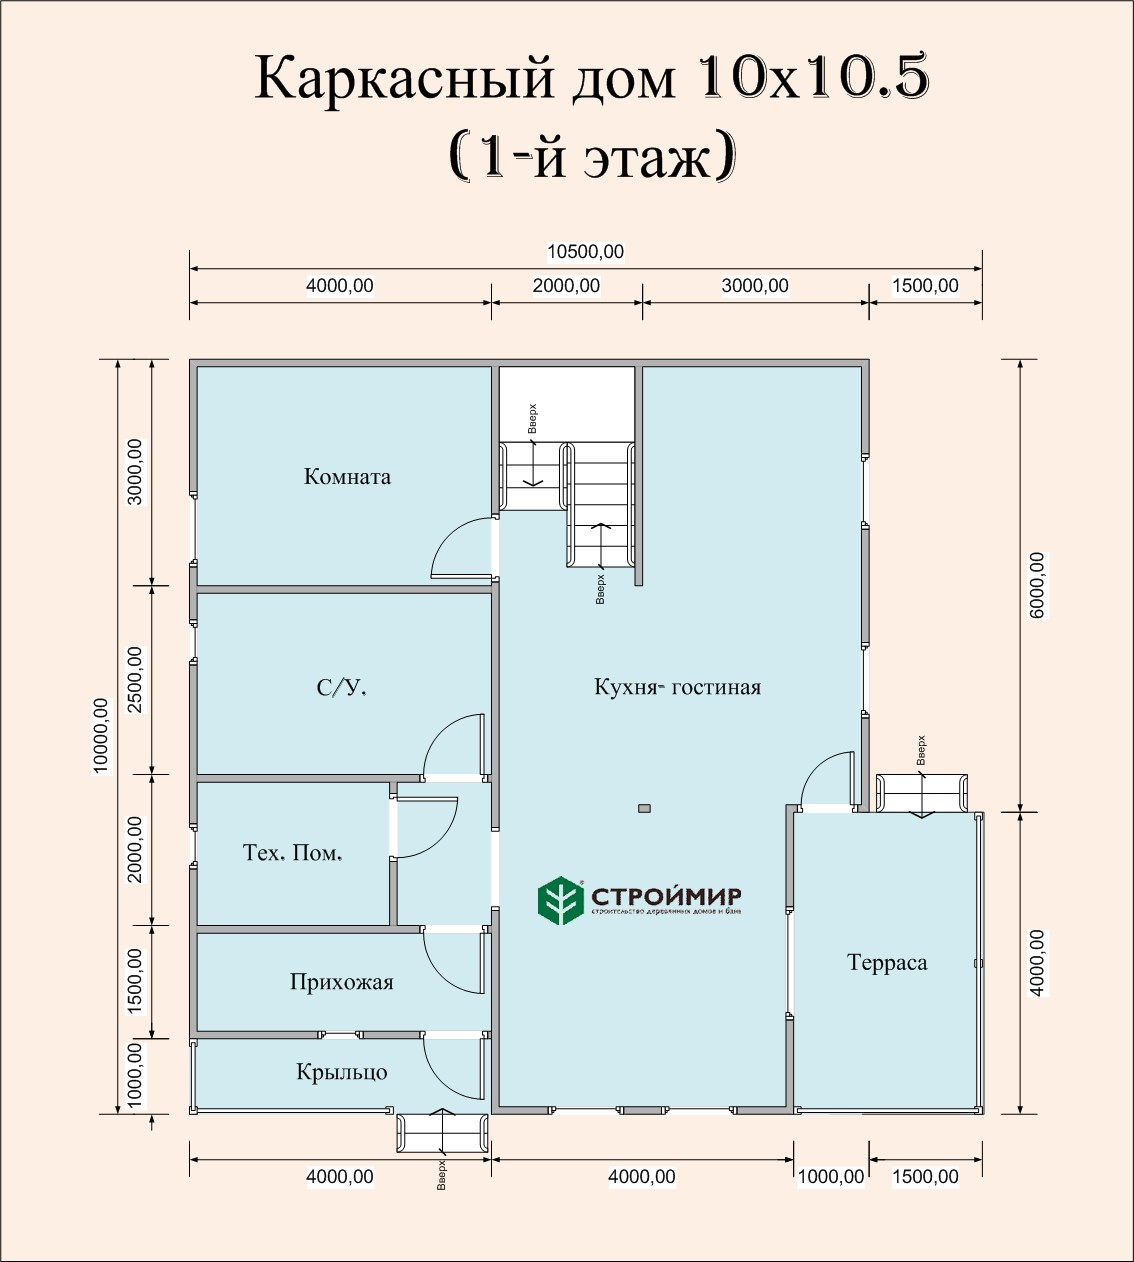 Каркасный дом 10х10,5 проект К-78